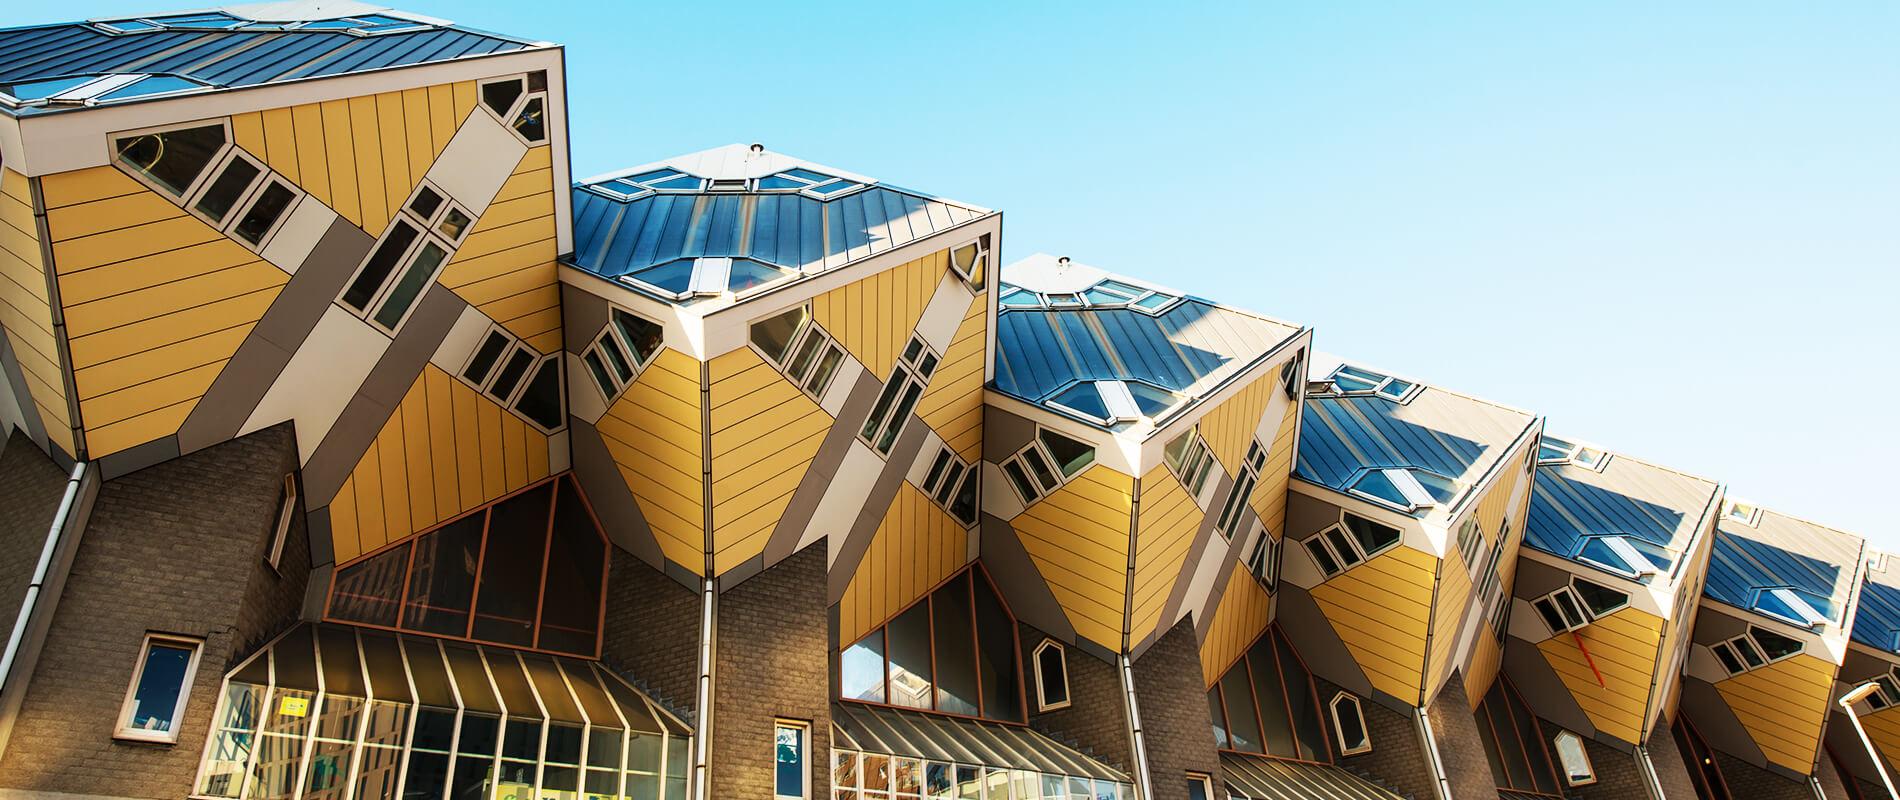 Kubuswoningen, le Case Cubo di Rotterdam